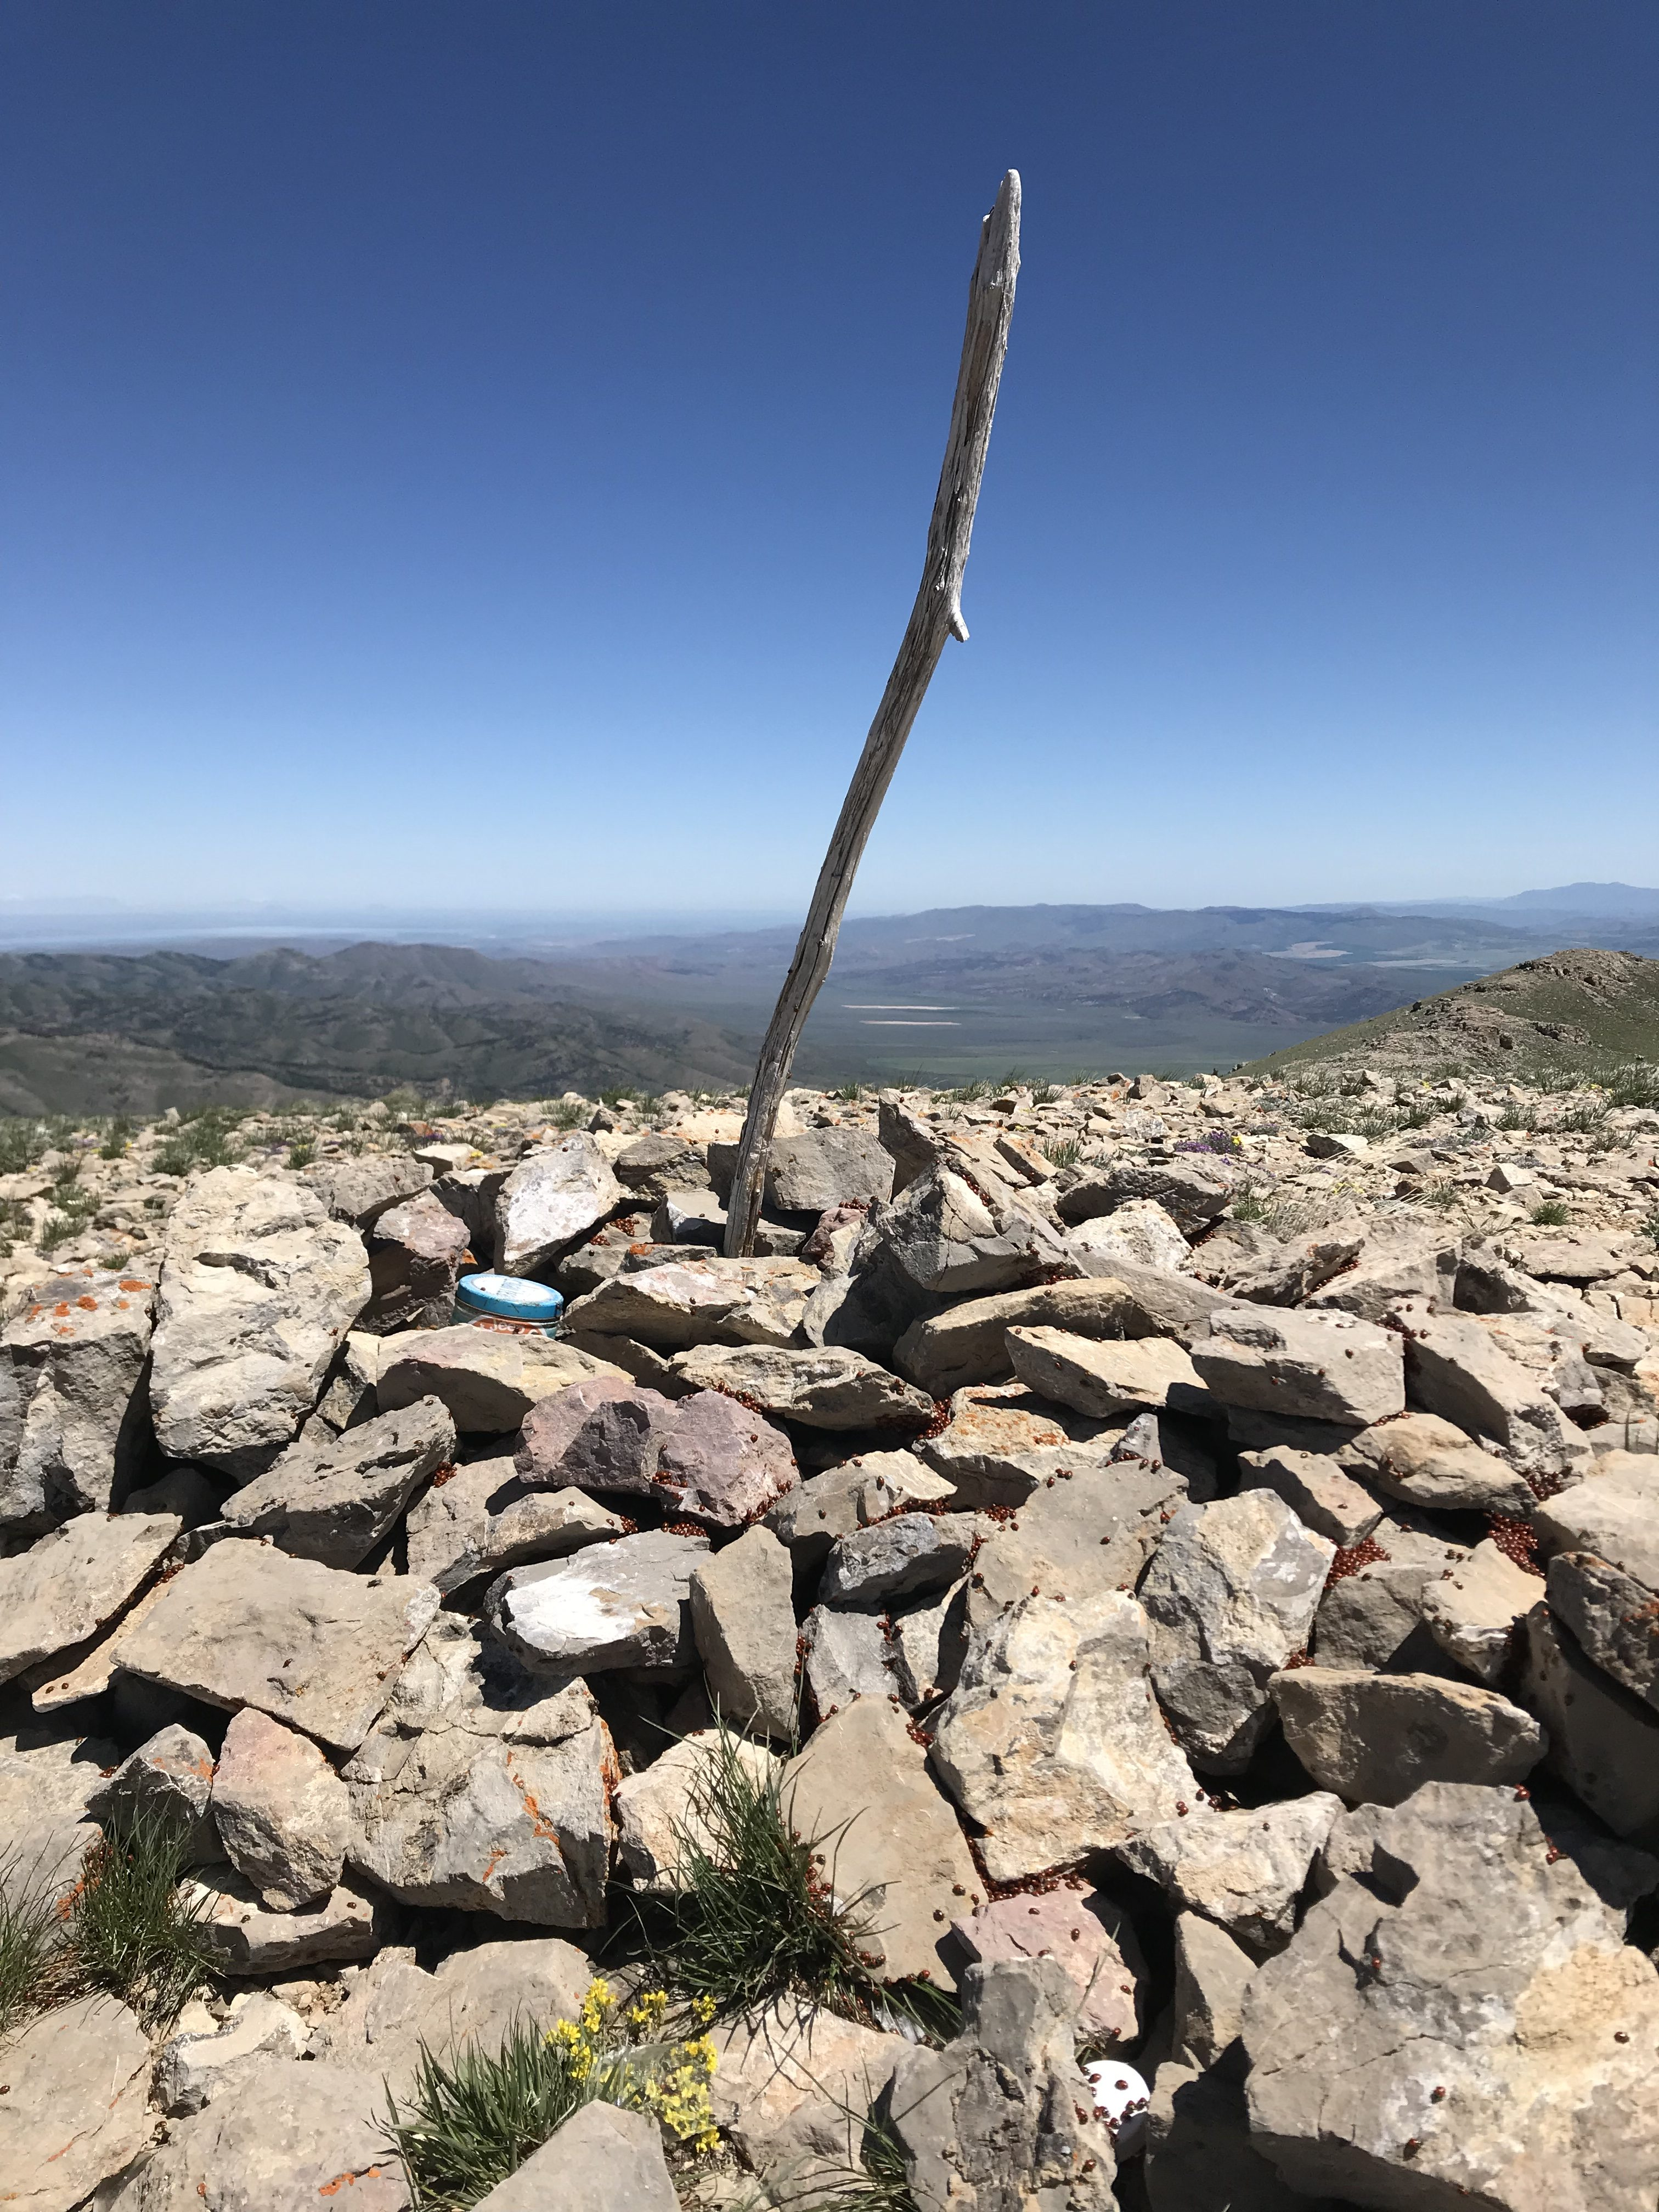 The summit cairn had three registers.